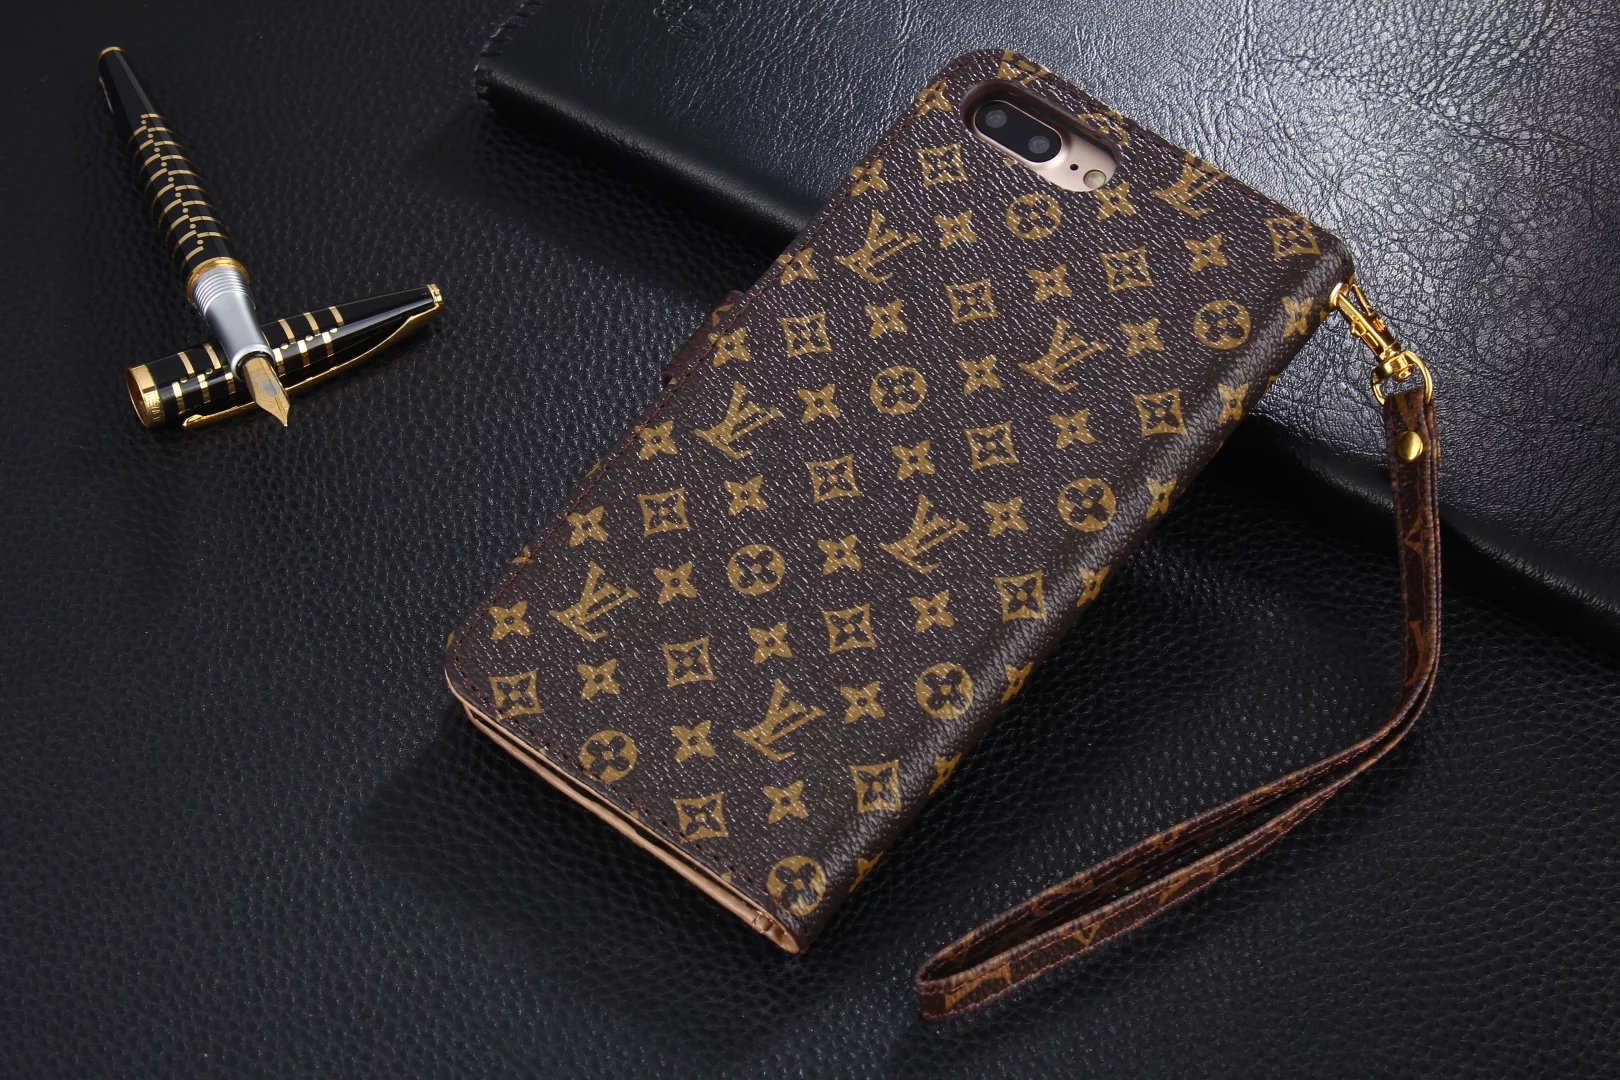 iphone 7 Plus cases expensive iphone 7 Plus cases fashion iphone7 Plus case designer samsung galaxy note 3 case iphone 7 Plus case for 7 Plus iphone 7 Plus case black i 7 Plus phone covers best cases for iphone 7 Plus best cases iphone 7 Plus